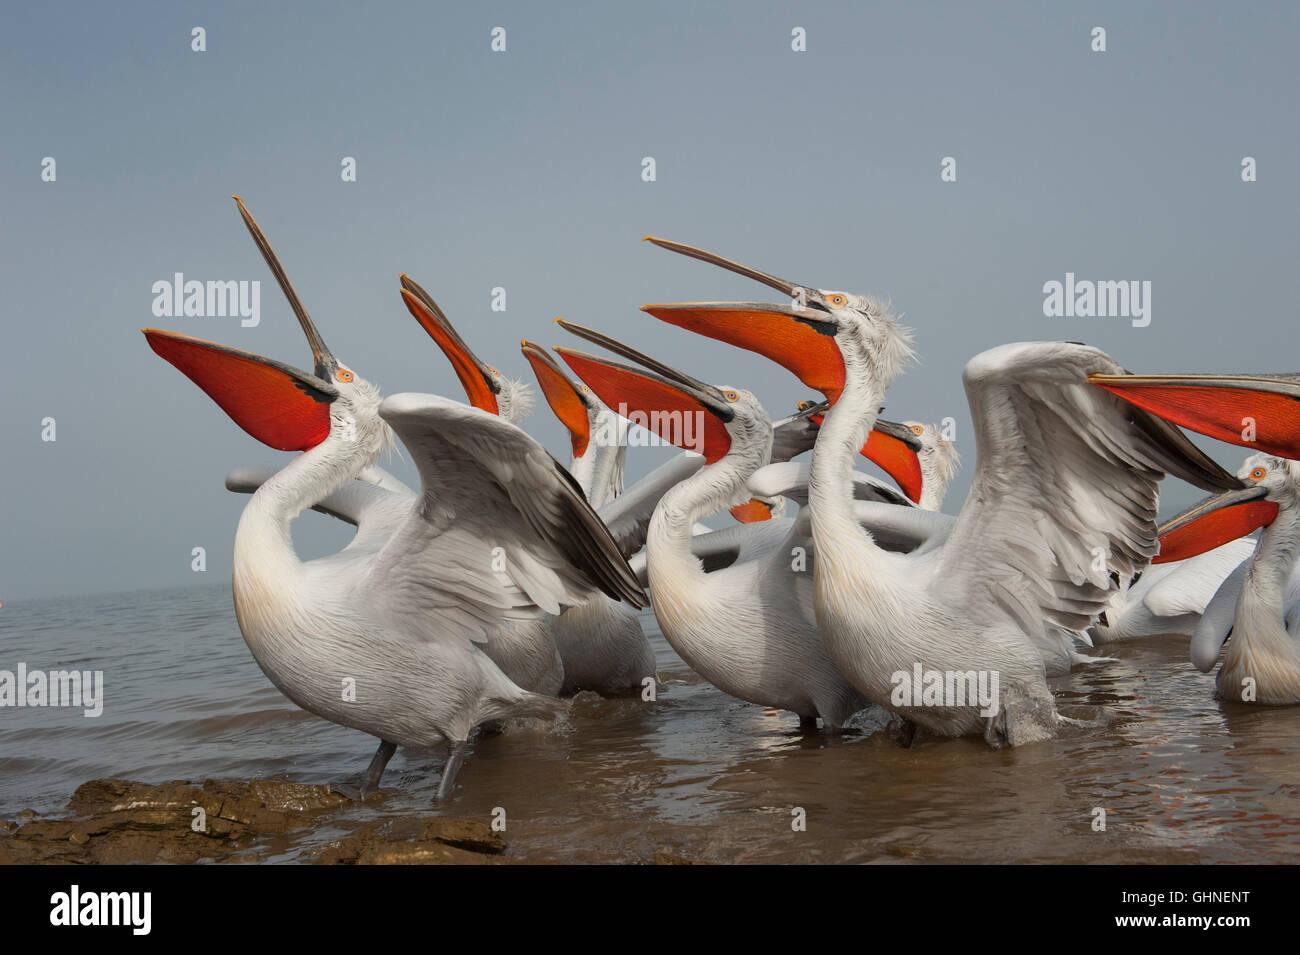 Dalmatian Pelican Pelecanus crispus Greece - Stock Image